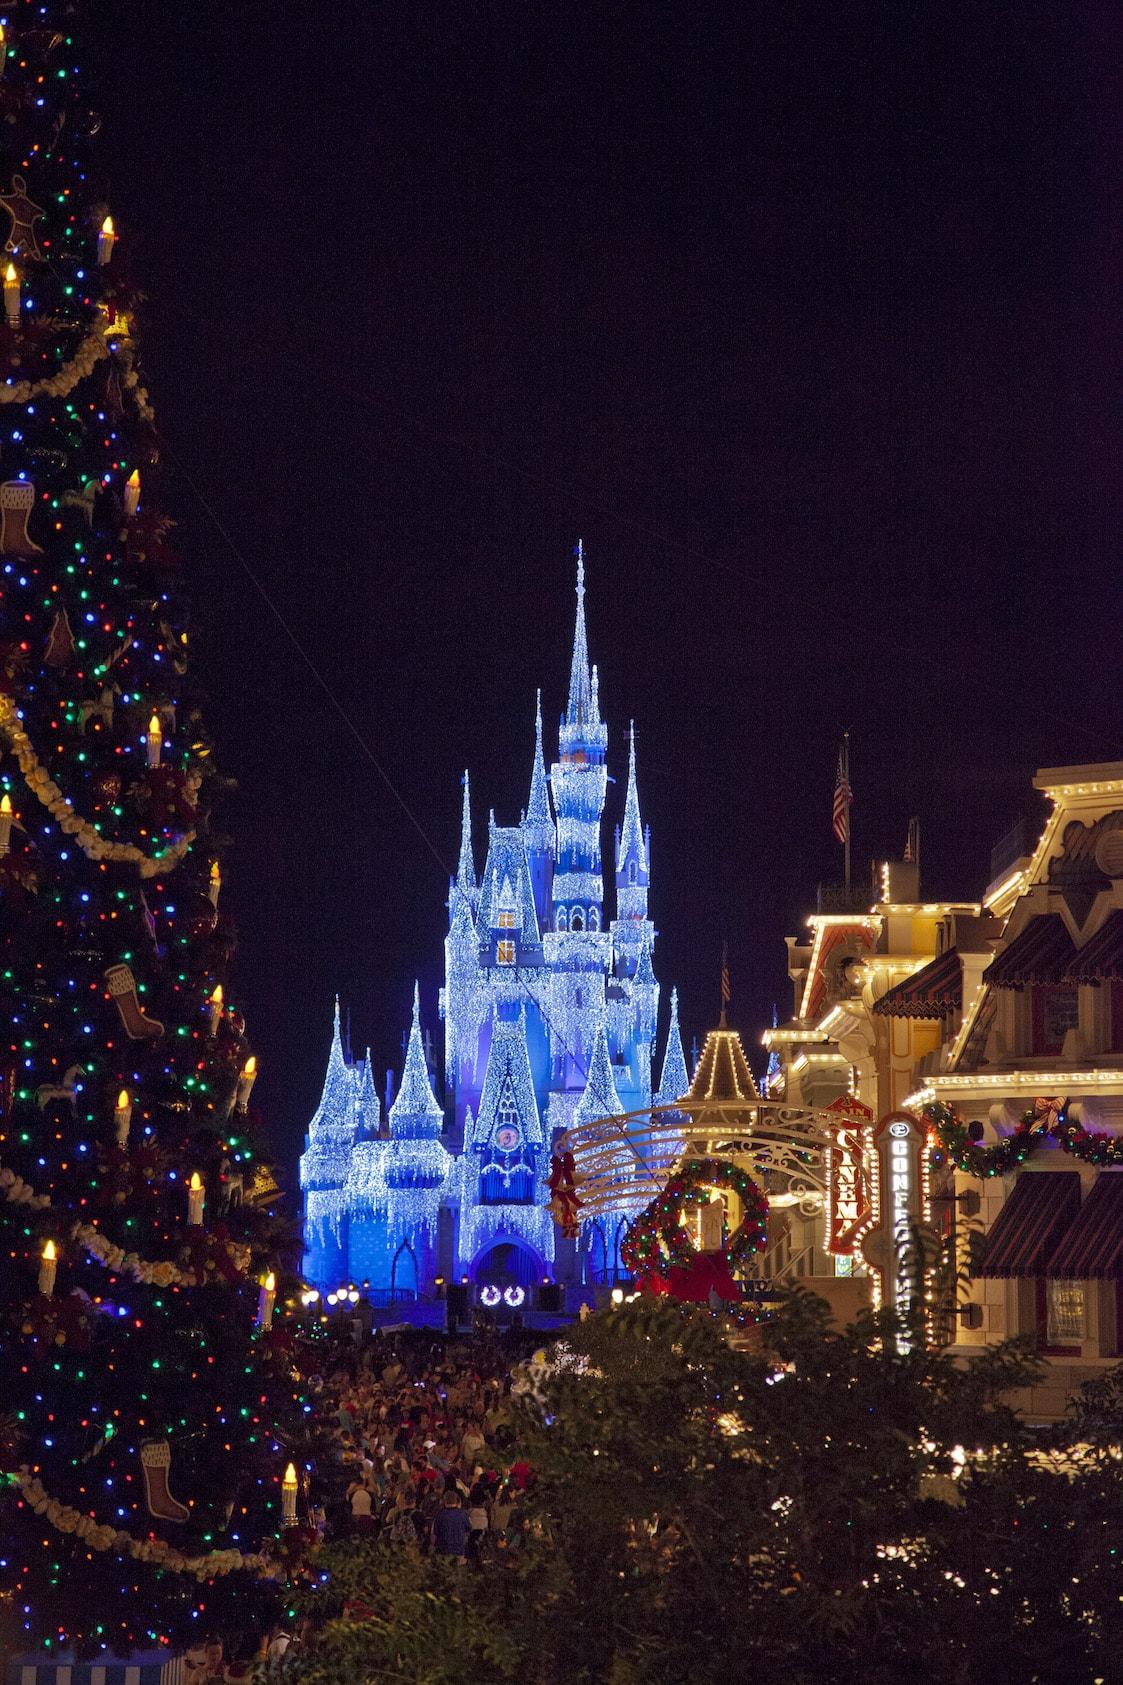 Cinderella Castle with Main Street USA and Christmas Tree Magic Kingdom at Night